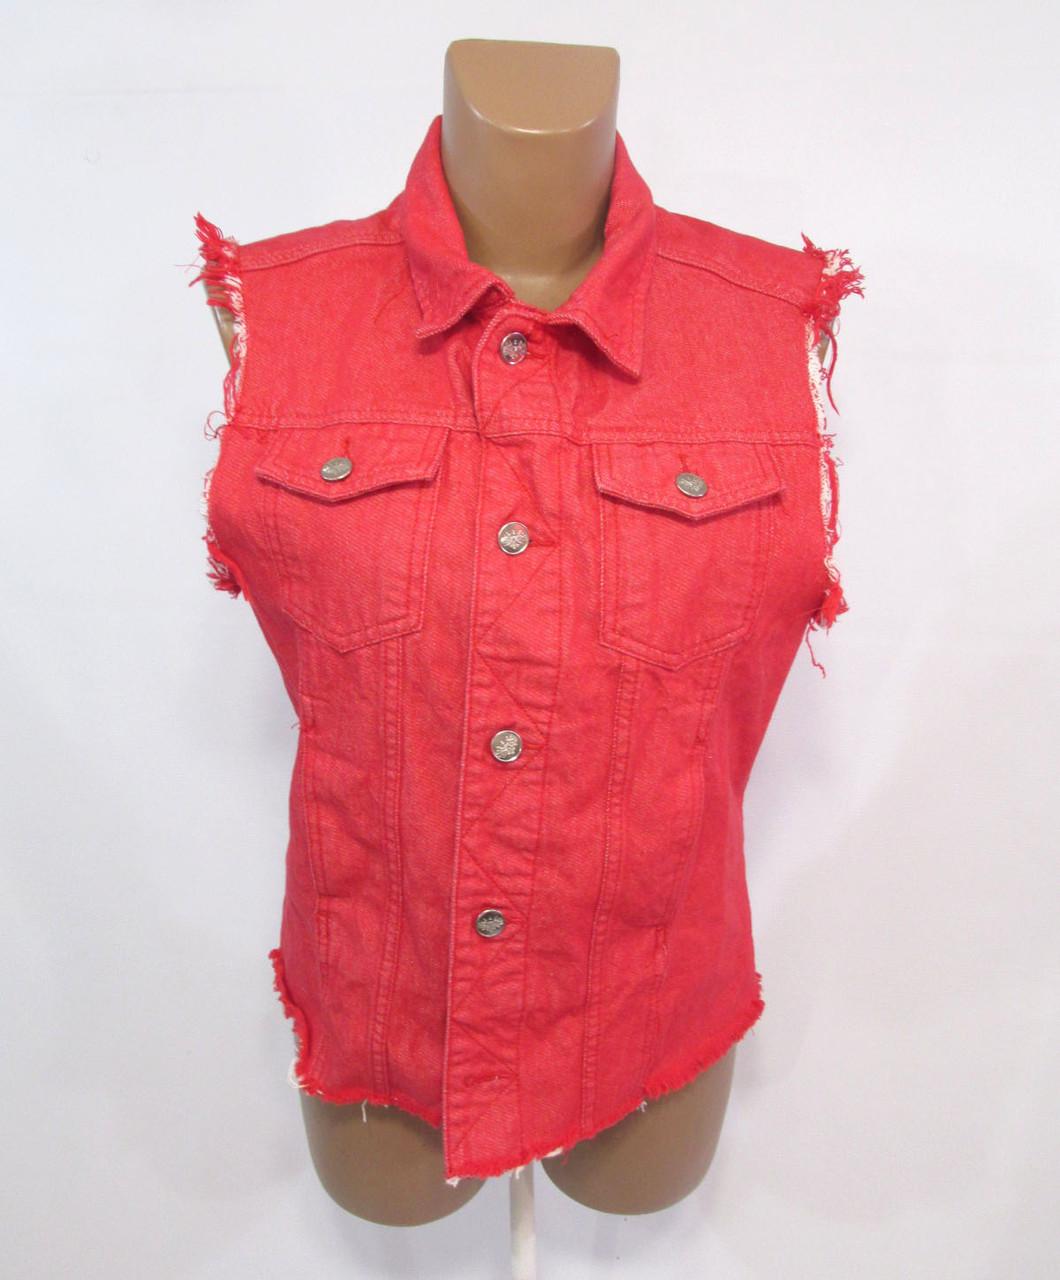 Куртка безрукавка Brother Annose, XS (6), красная, джинсовая, Как Нова